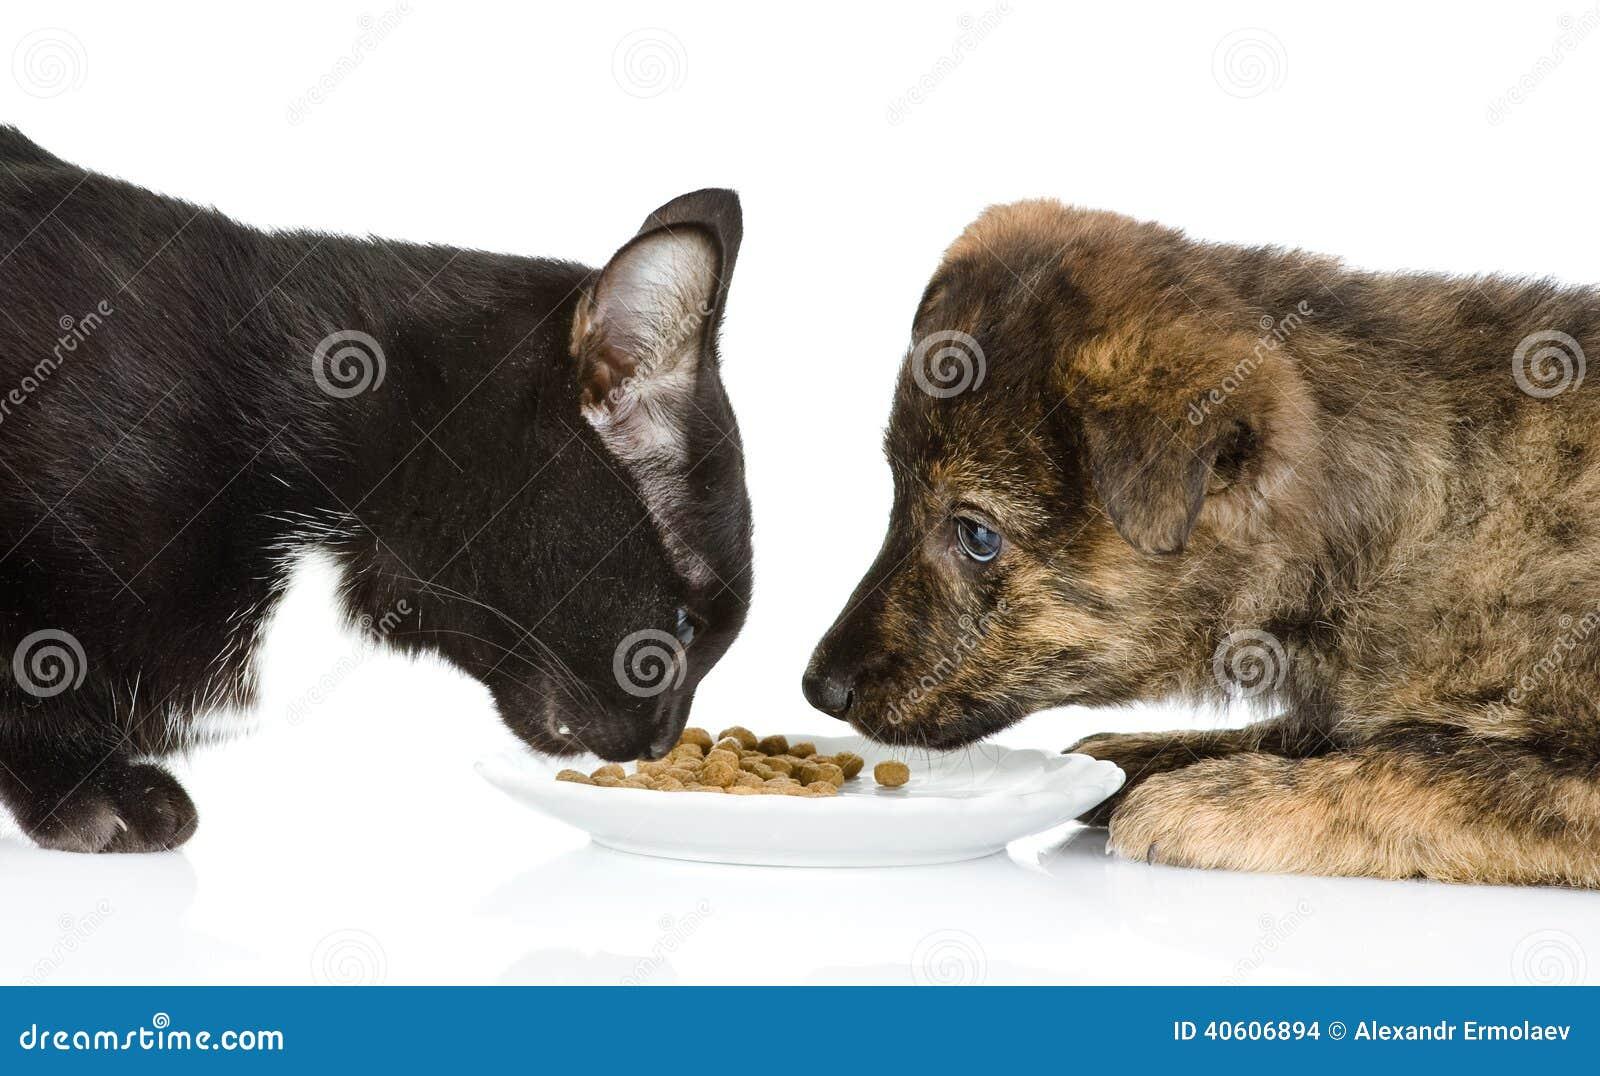 My Cat Keeps Eating Dog Food